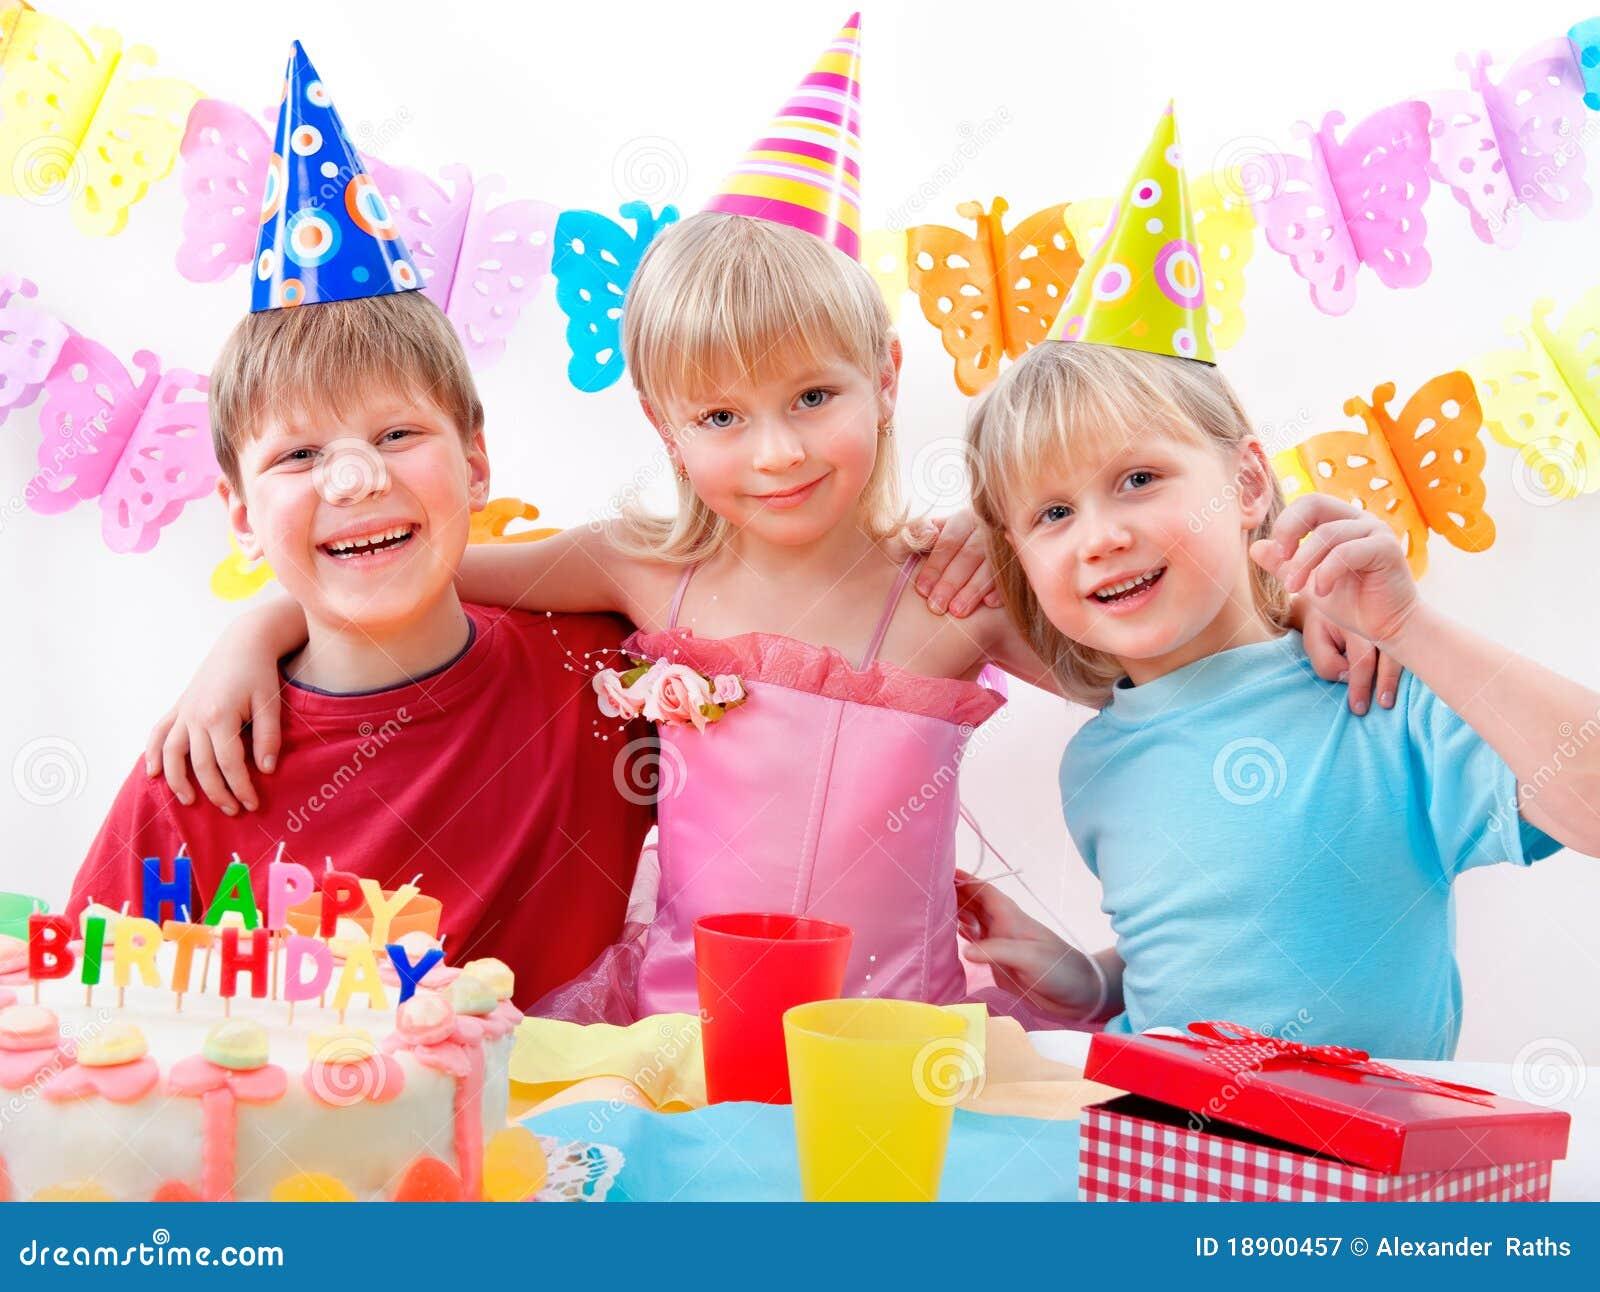 Geburtstagsfeier stockbild bild von haupt dekoration - Fiestas de cumpleanos originales para adultos ...